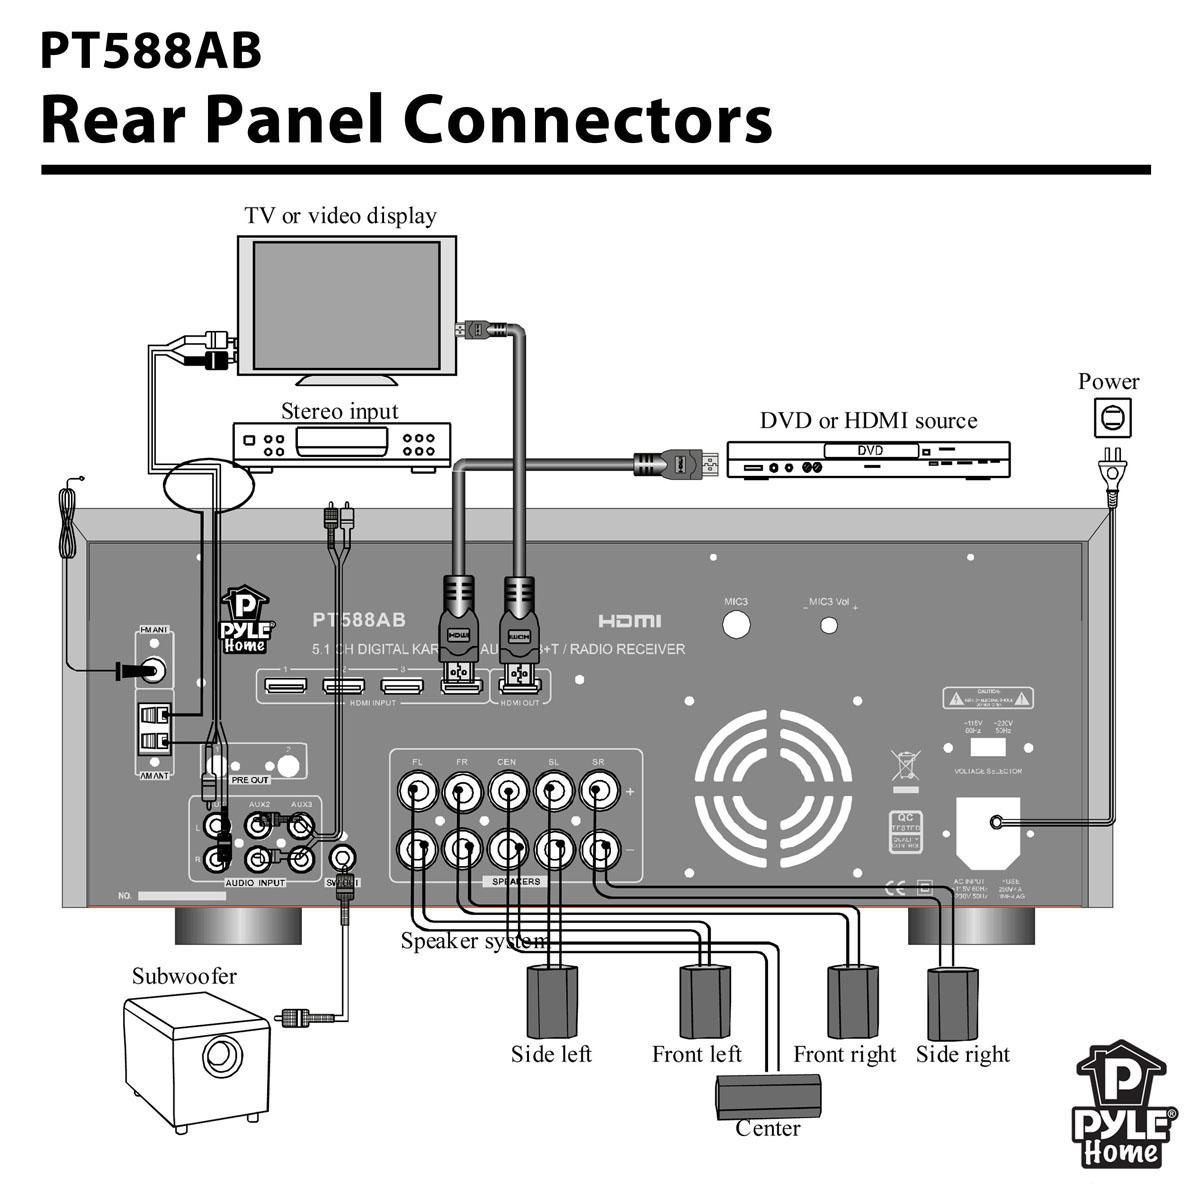 WM 40] Amplifier Wiring Diagram Home Theater Amplifier 40 40 ...